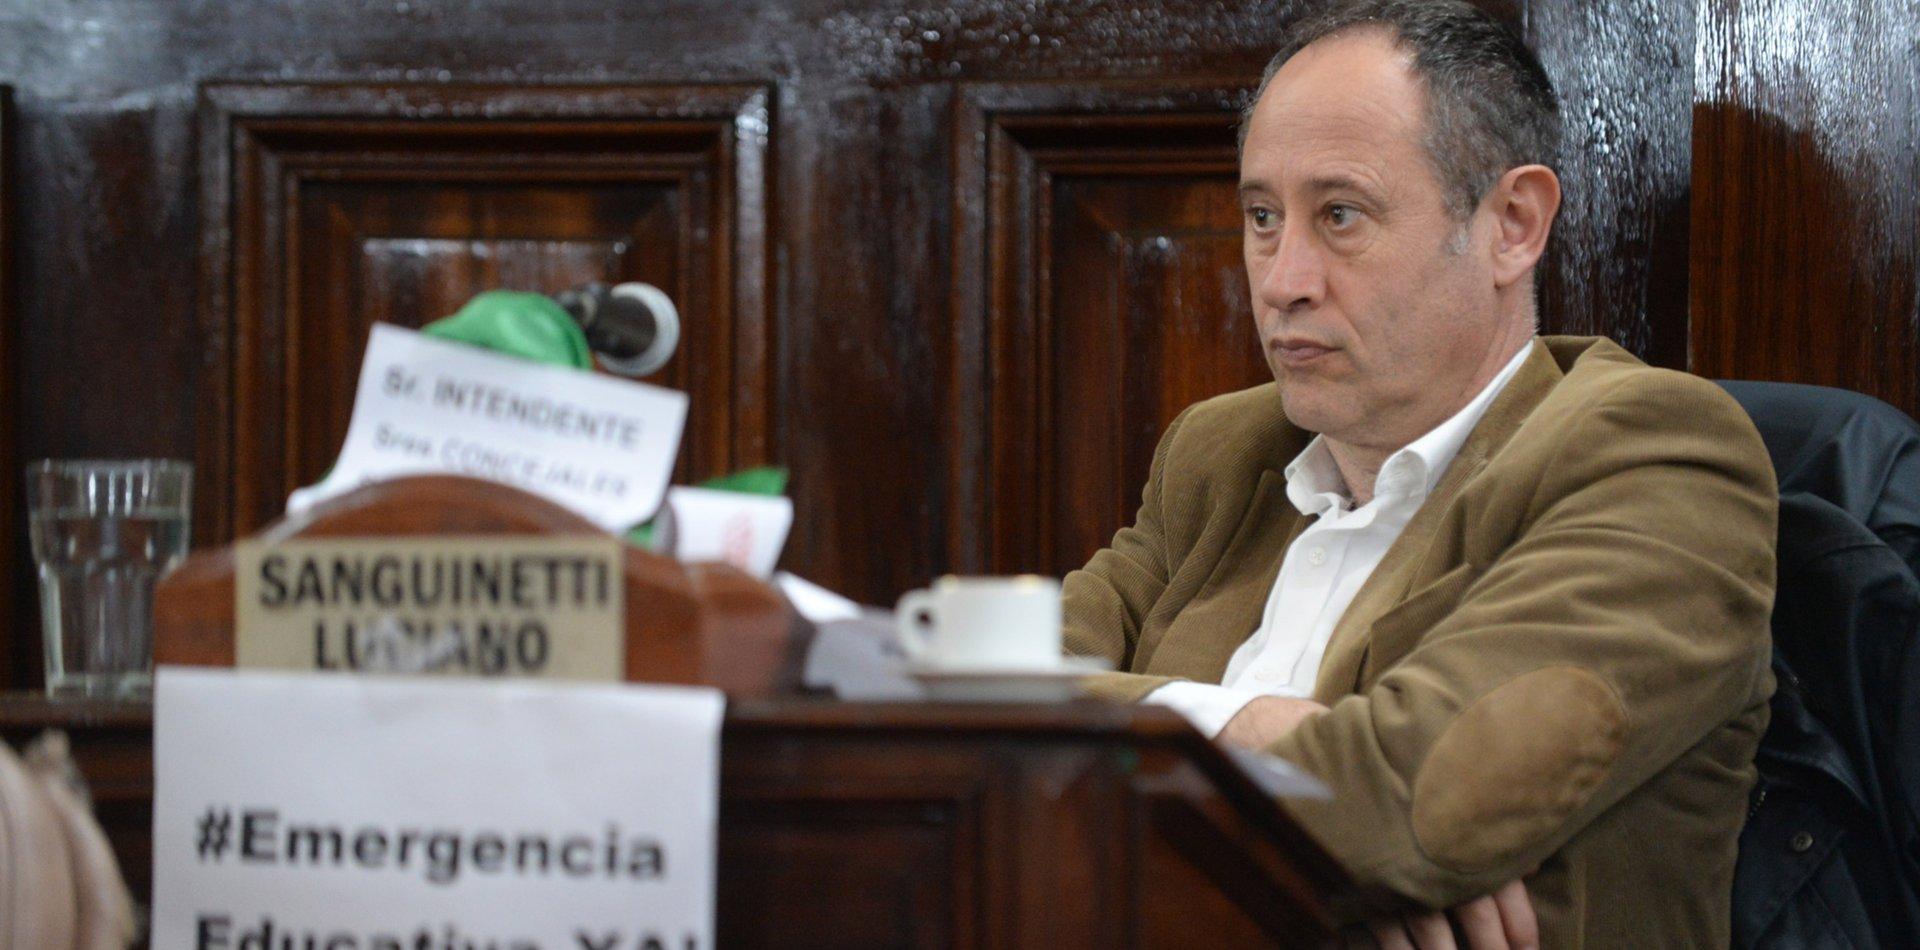 Arrancó la campaña: el concejal Sanguinetti se lanzó para ser intendente de La Plata